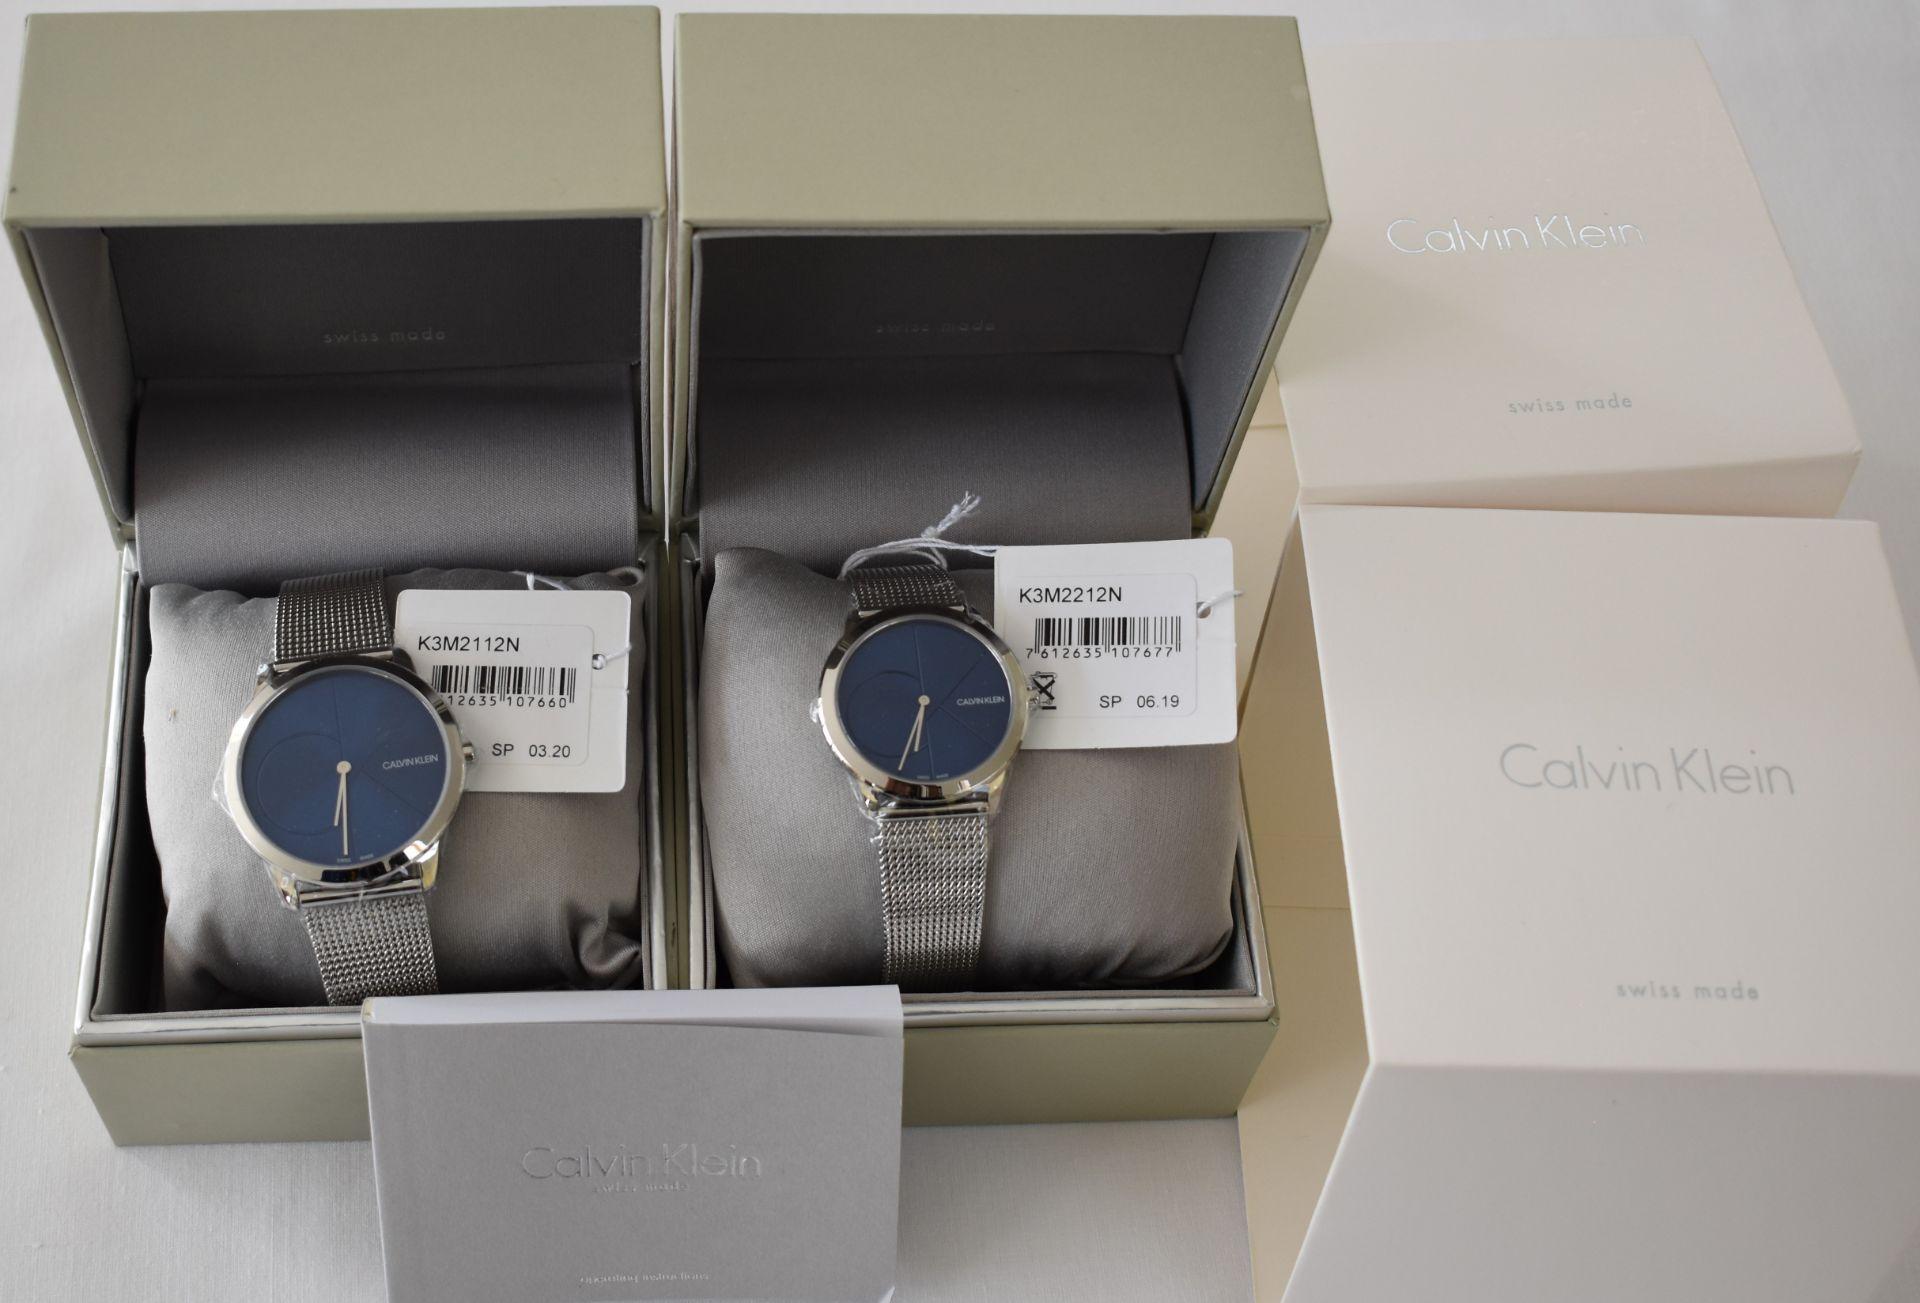 Calvin klein His/Her K3M2112N/K3M2212N Watches